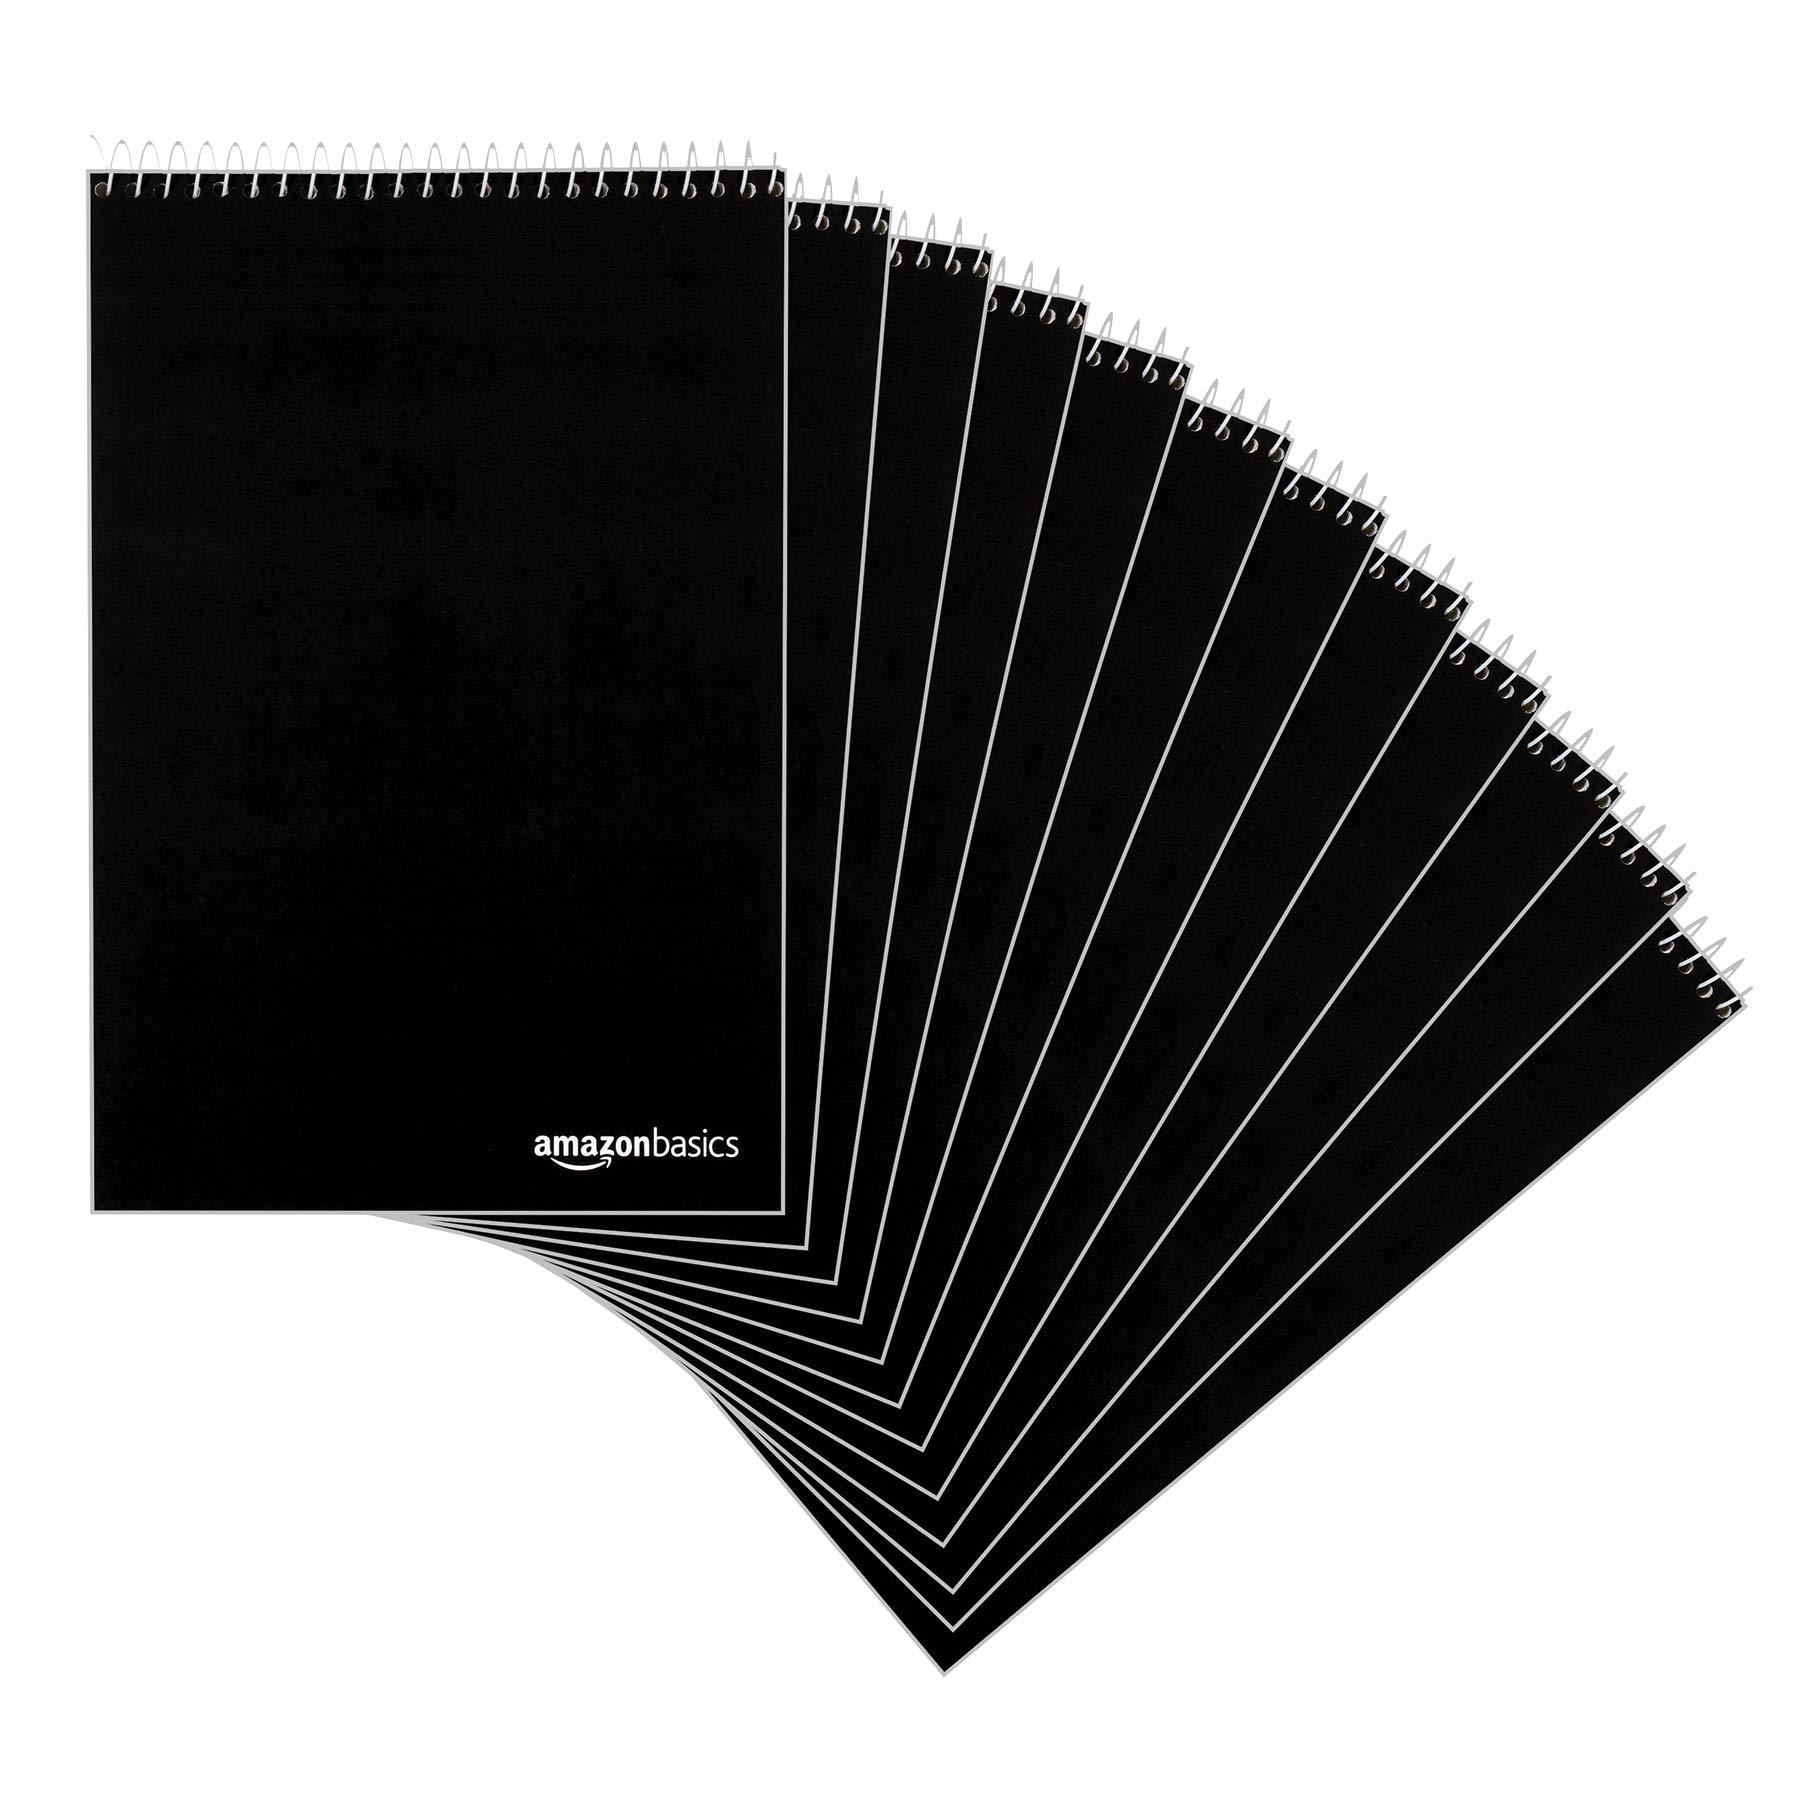 "AmazonBasics Steno Books, 6"" x 9"", Gregg Rule, Green Paper, 80 Sheets, 12-Pack"